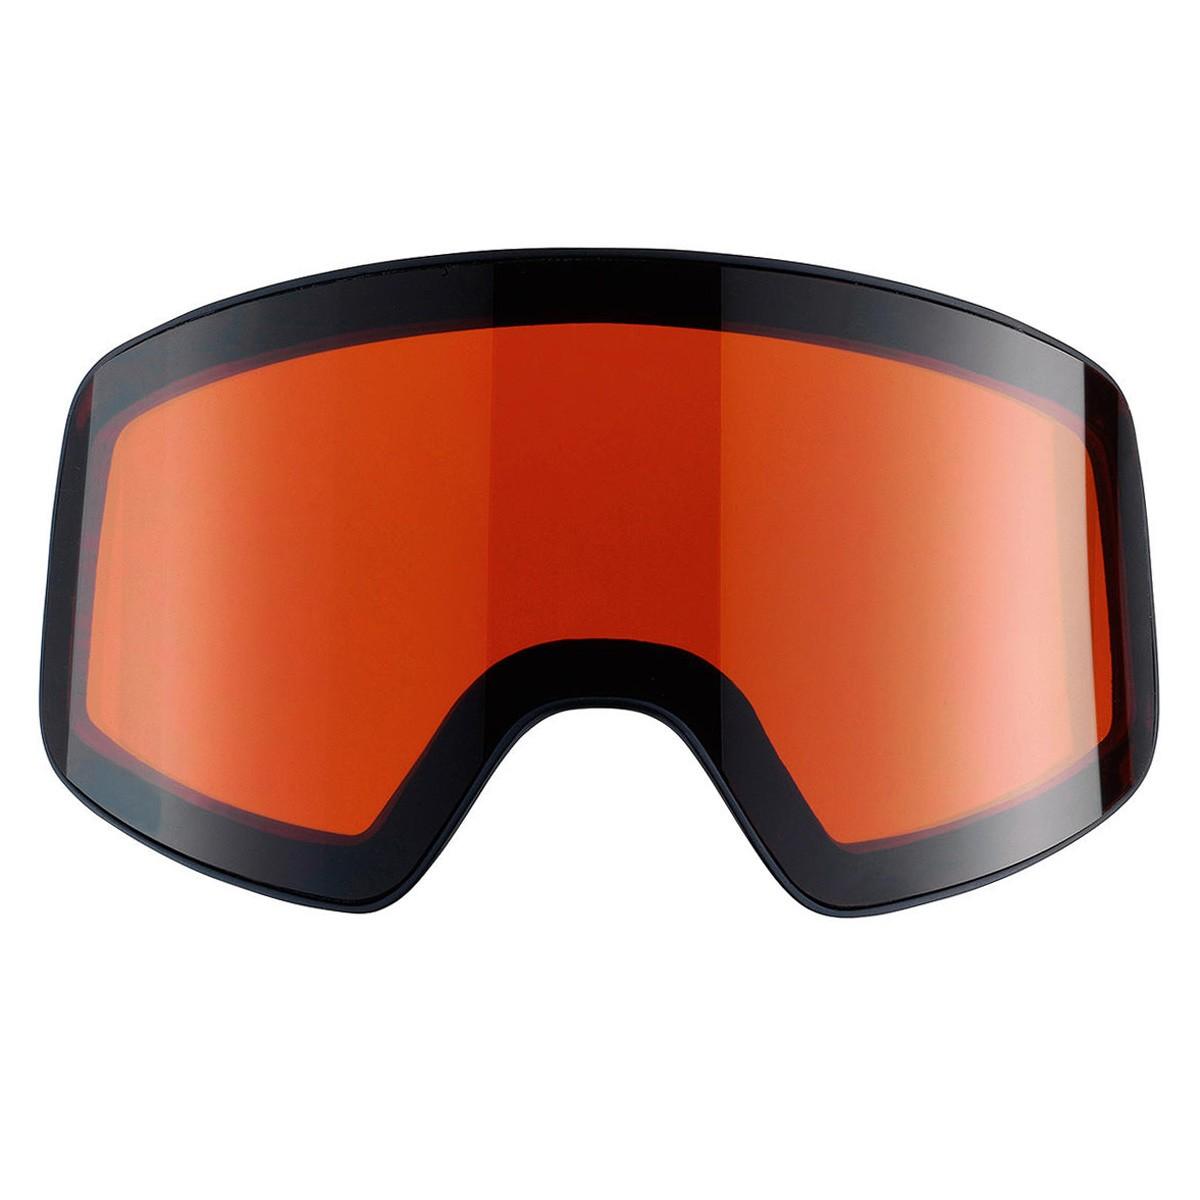 5da2bc4c1afc Ski goggle Head Horizon Race + lens - Ski and snowboard goggles